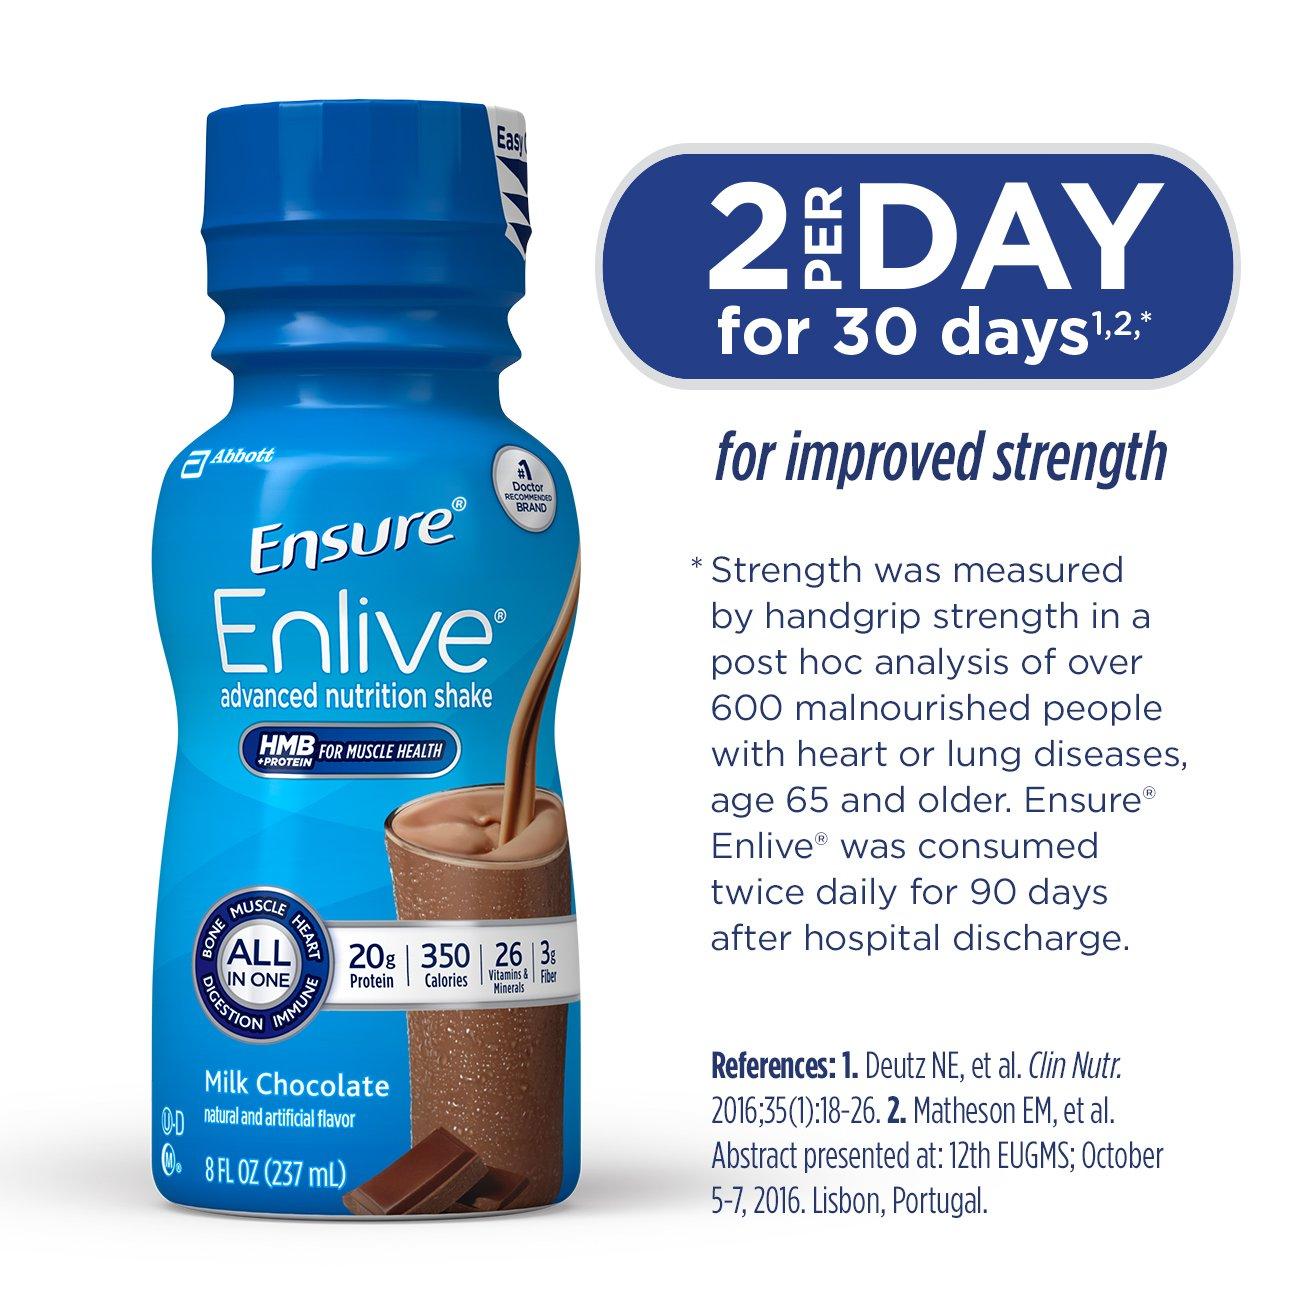 Amazon.com: Ensure Enlive Advanced Nutrition Shake with HMB, Milk ...